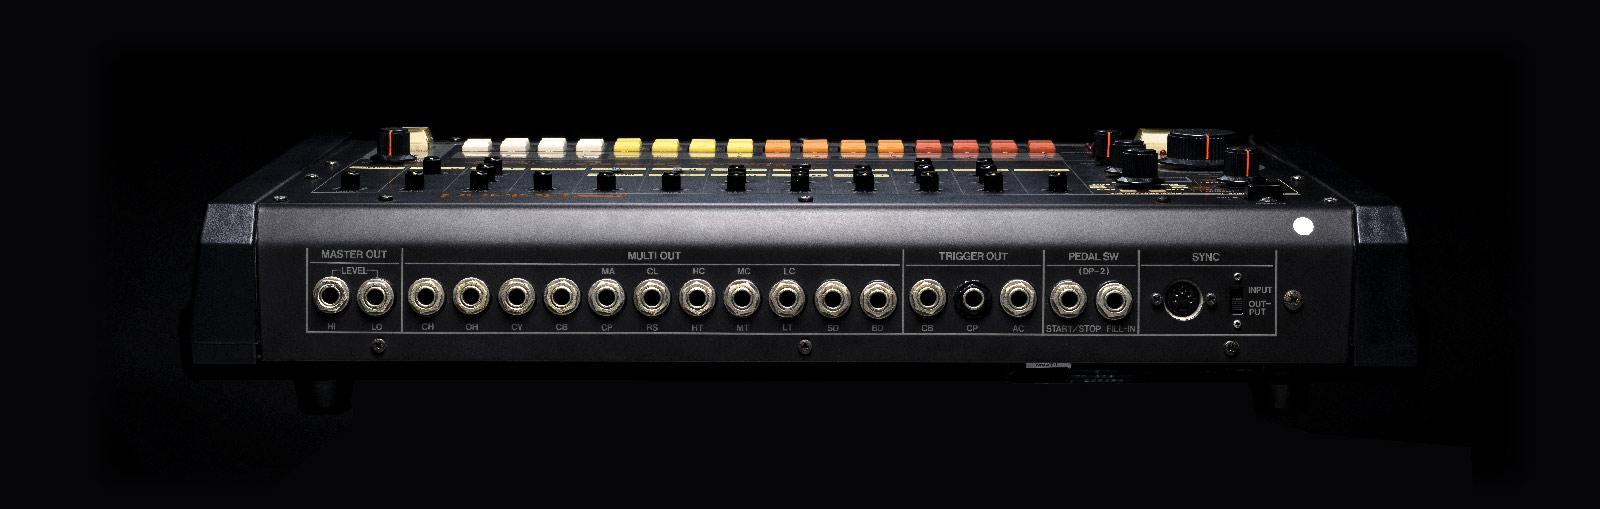 TR-808 Back Panel